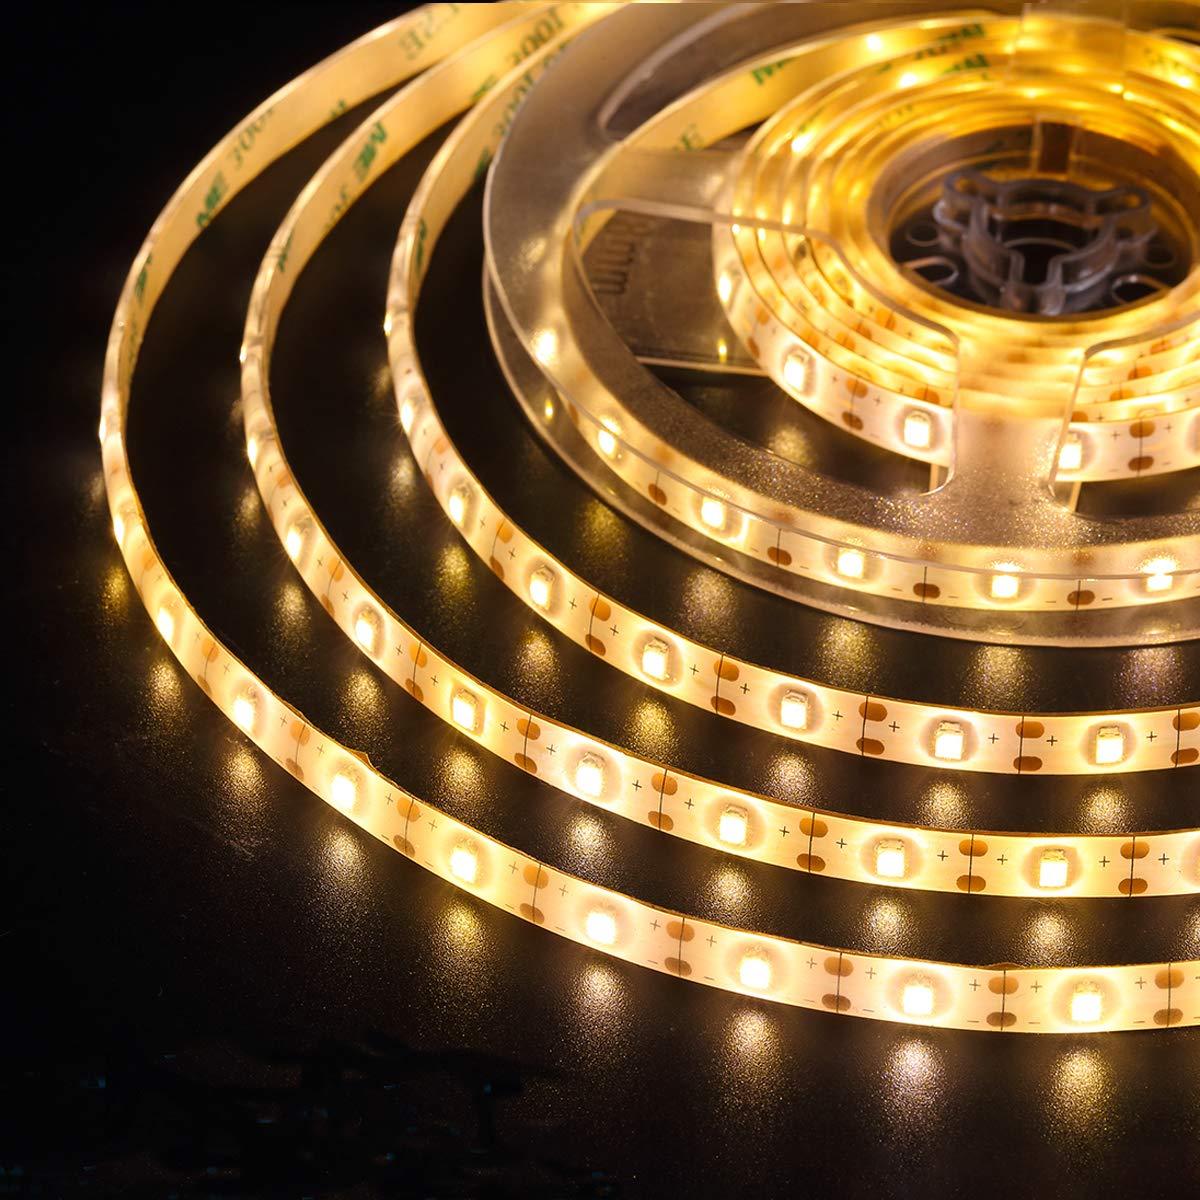 (2019 New) AMIR LED Strip Lights, 90 LED 9.84ft Flexible Solar Strip Lights, 8 Lighting Modes, Waterproof for Patio, Garden, Home, Wedding, Courtyard (Warm White)